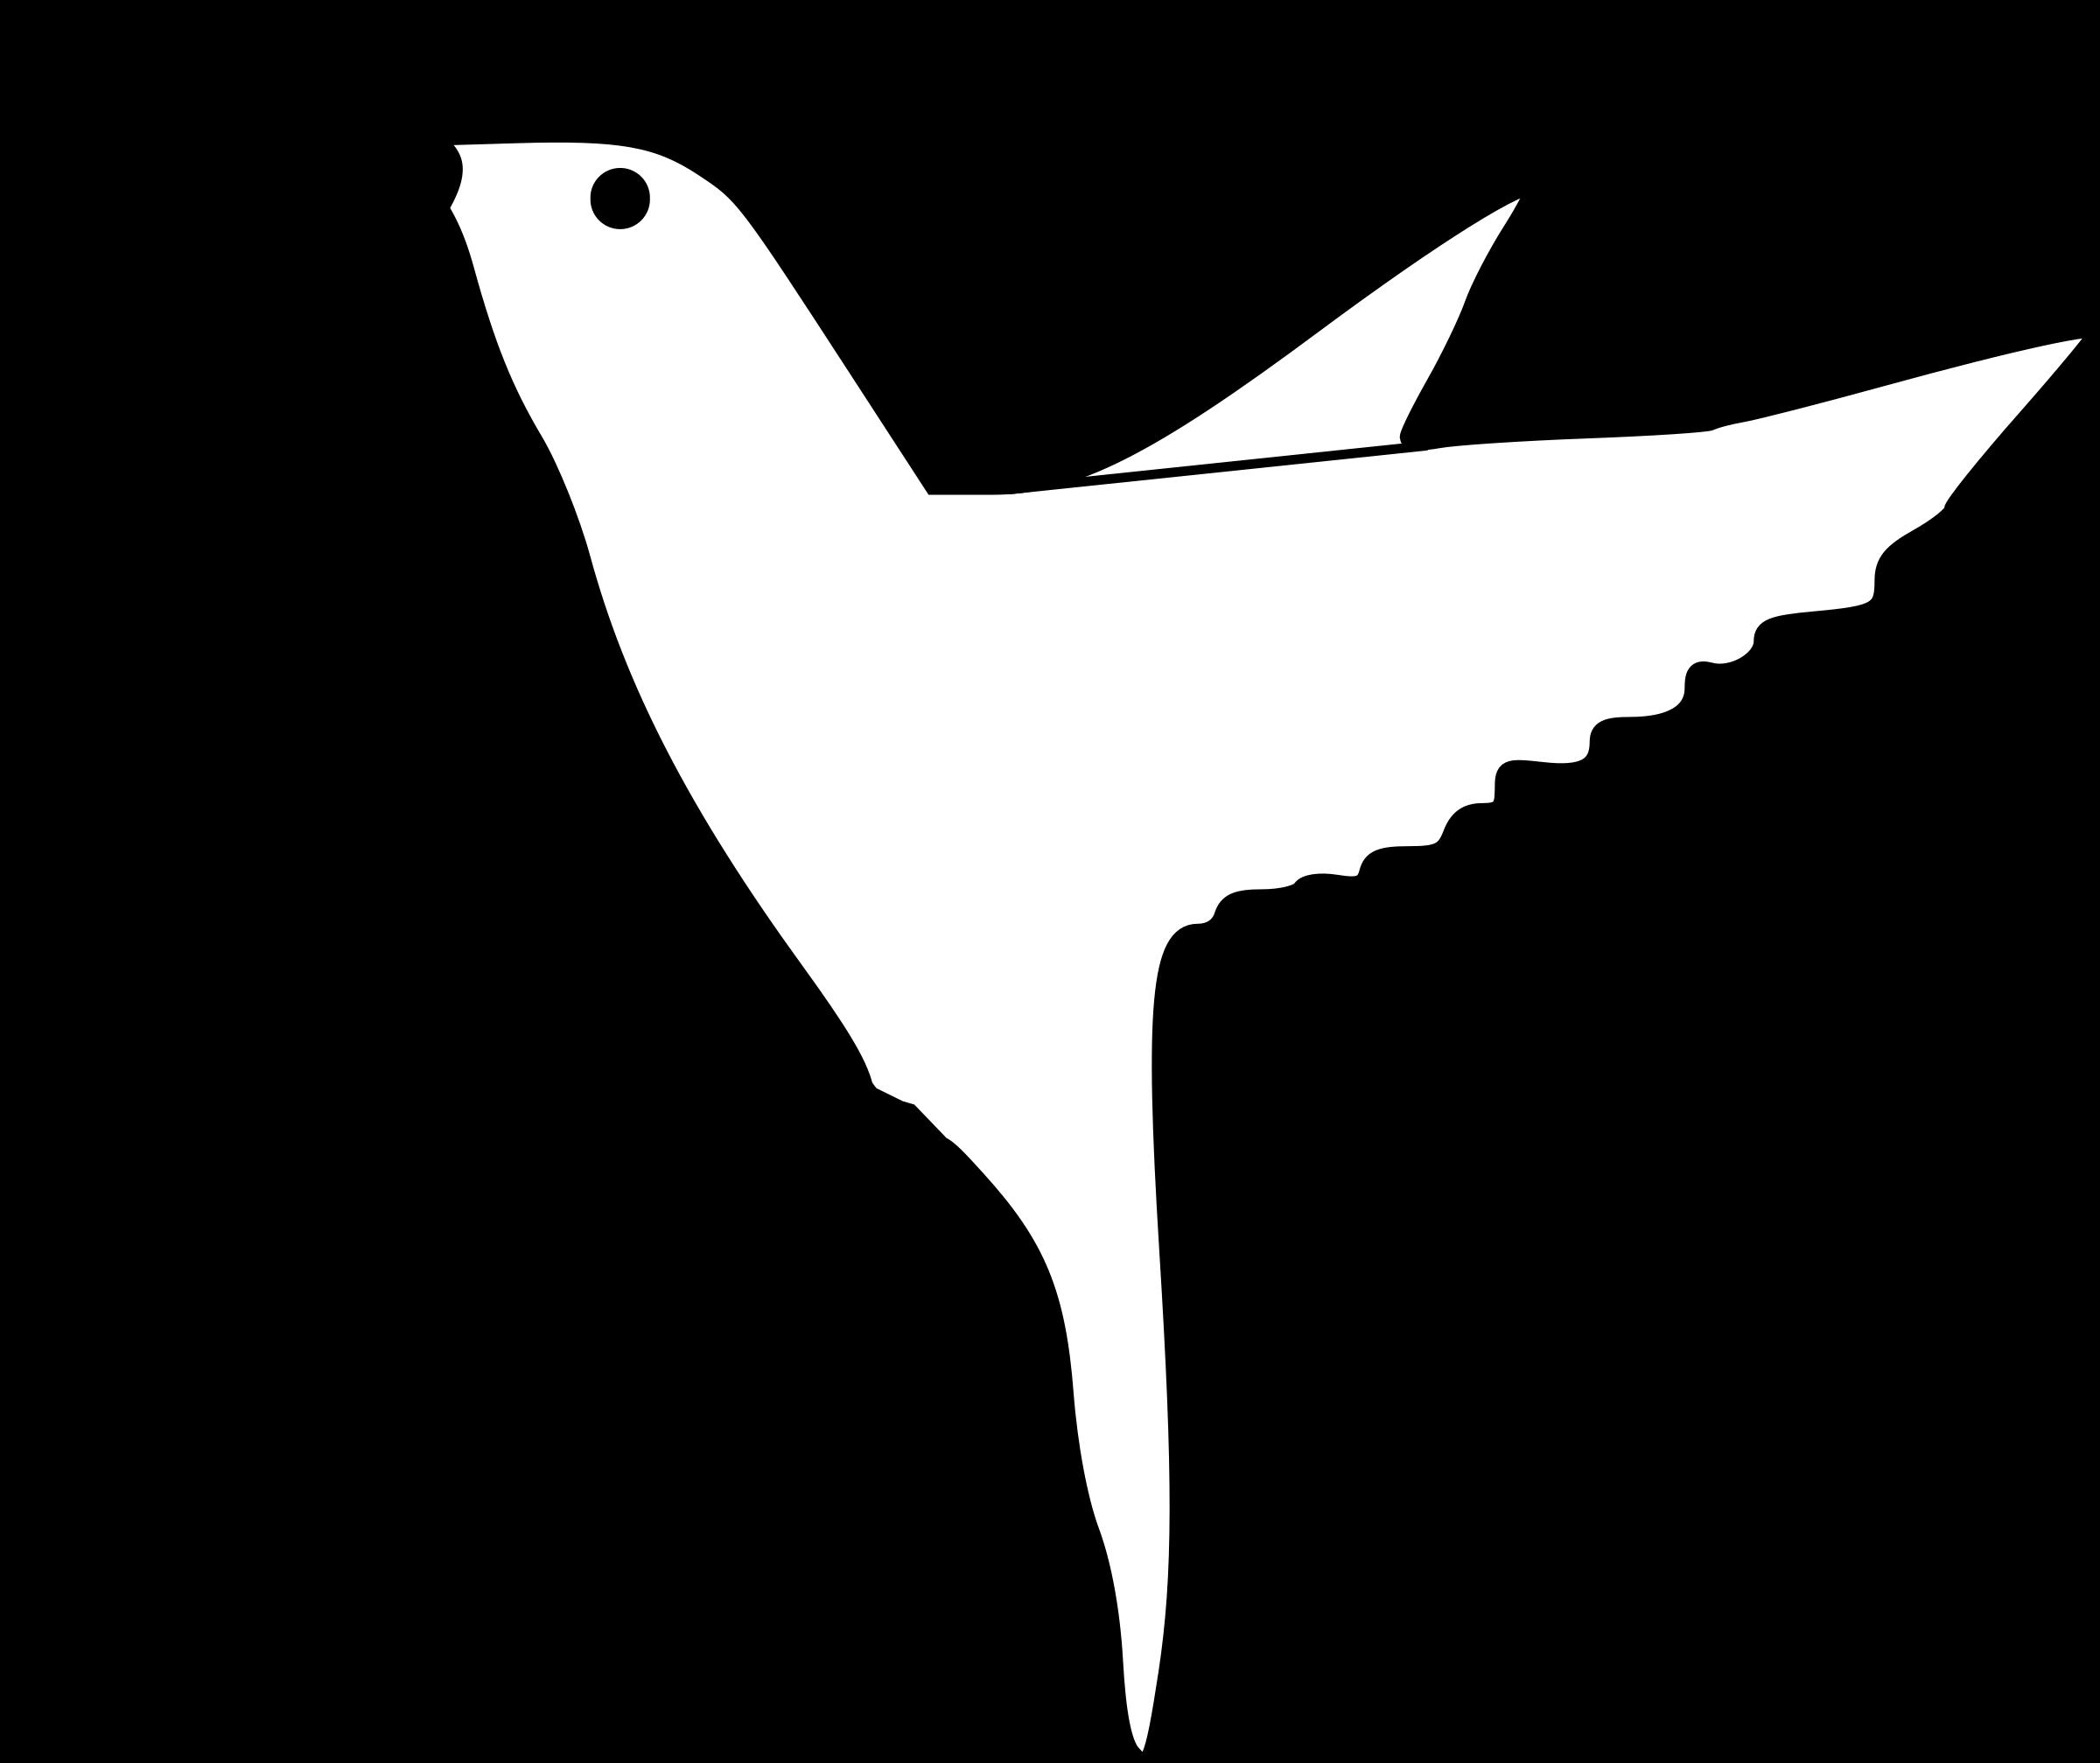 Big image png. Hummingbird clipart simple